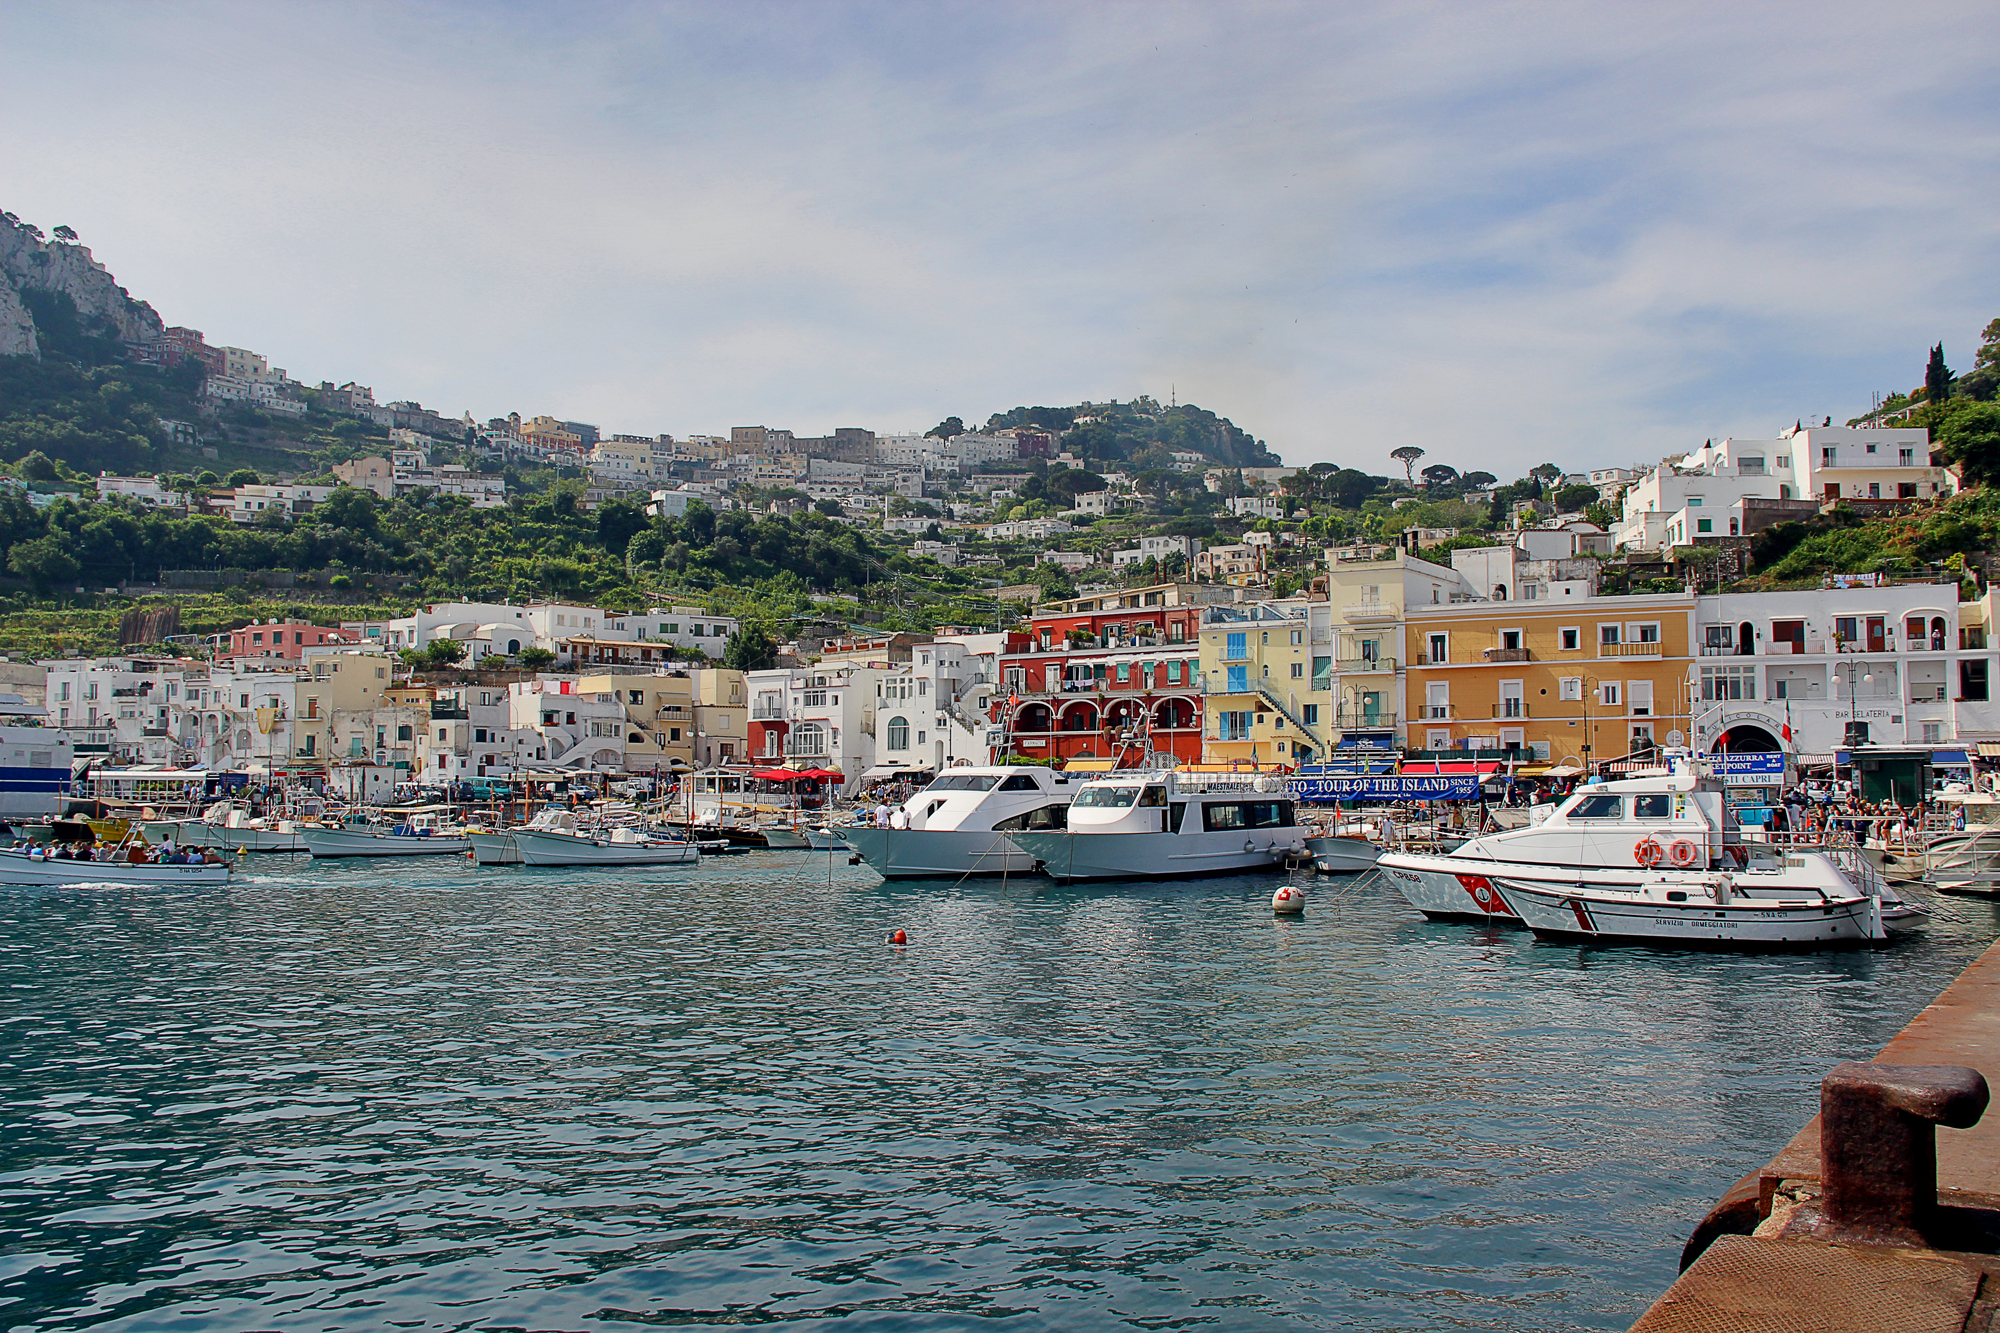 The landing at Capri...